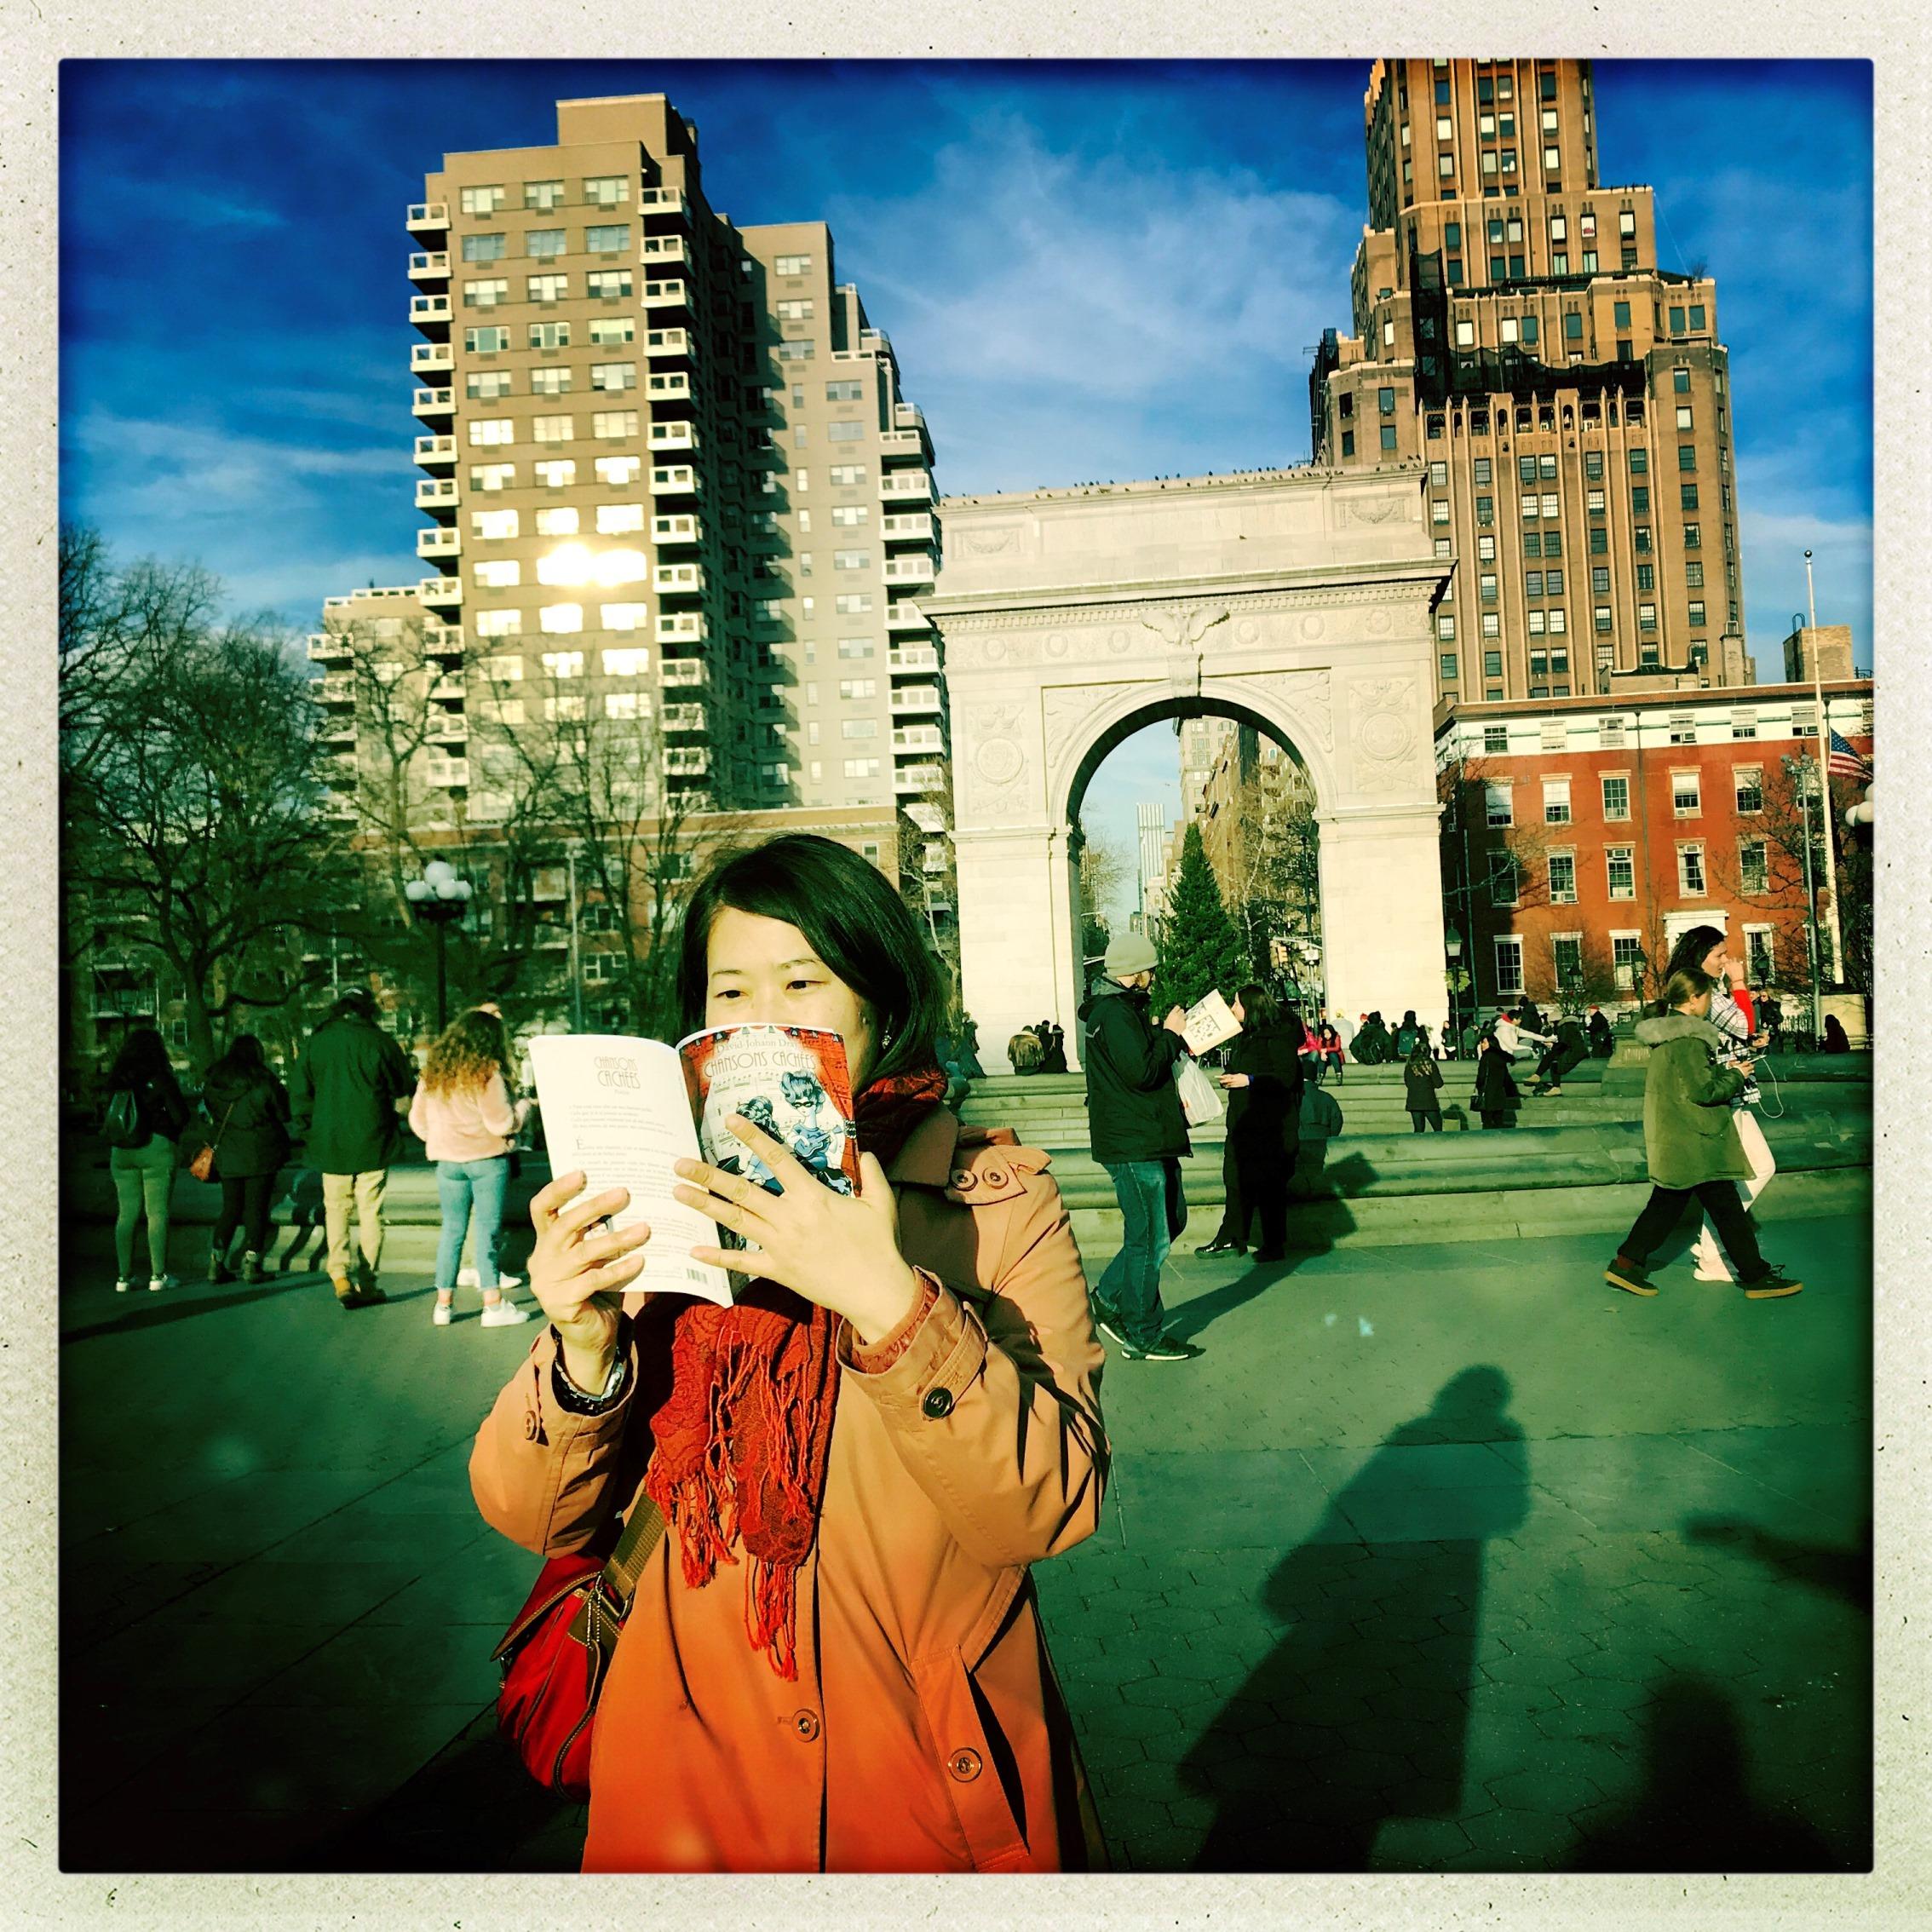 Washington square - Manhattan